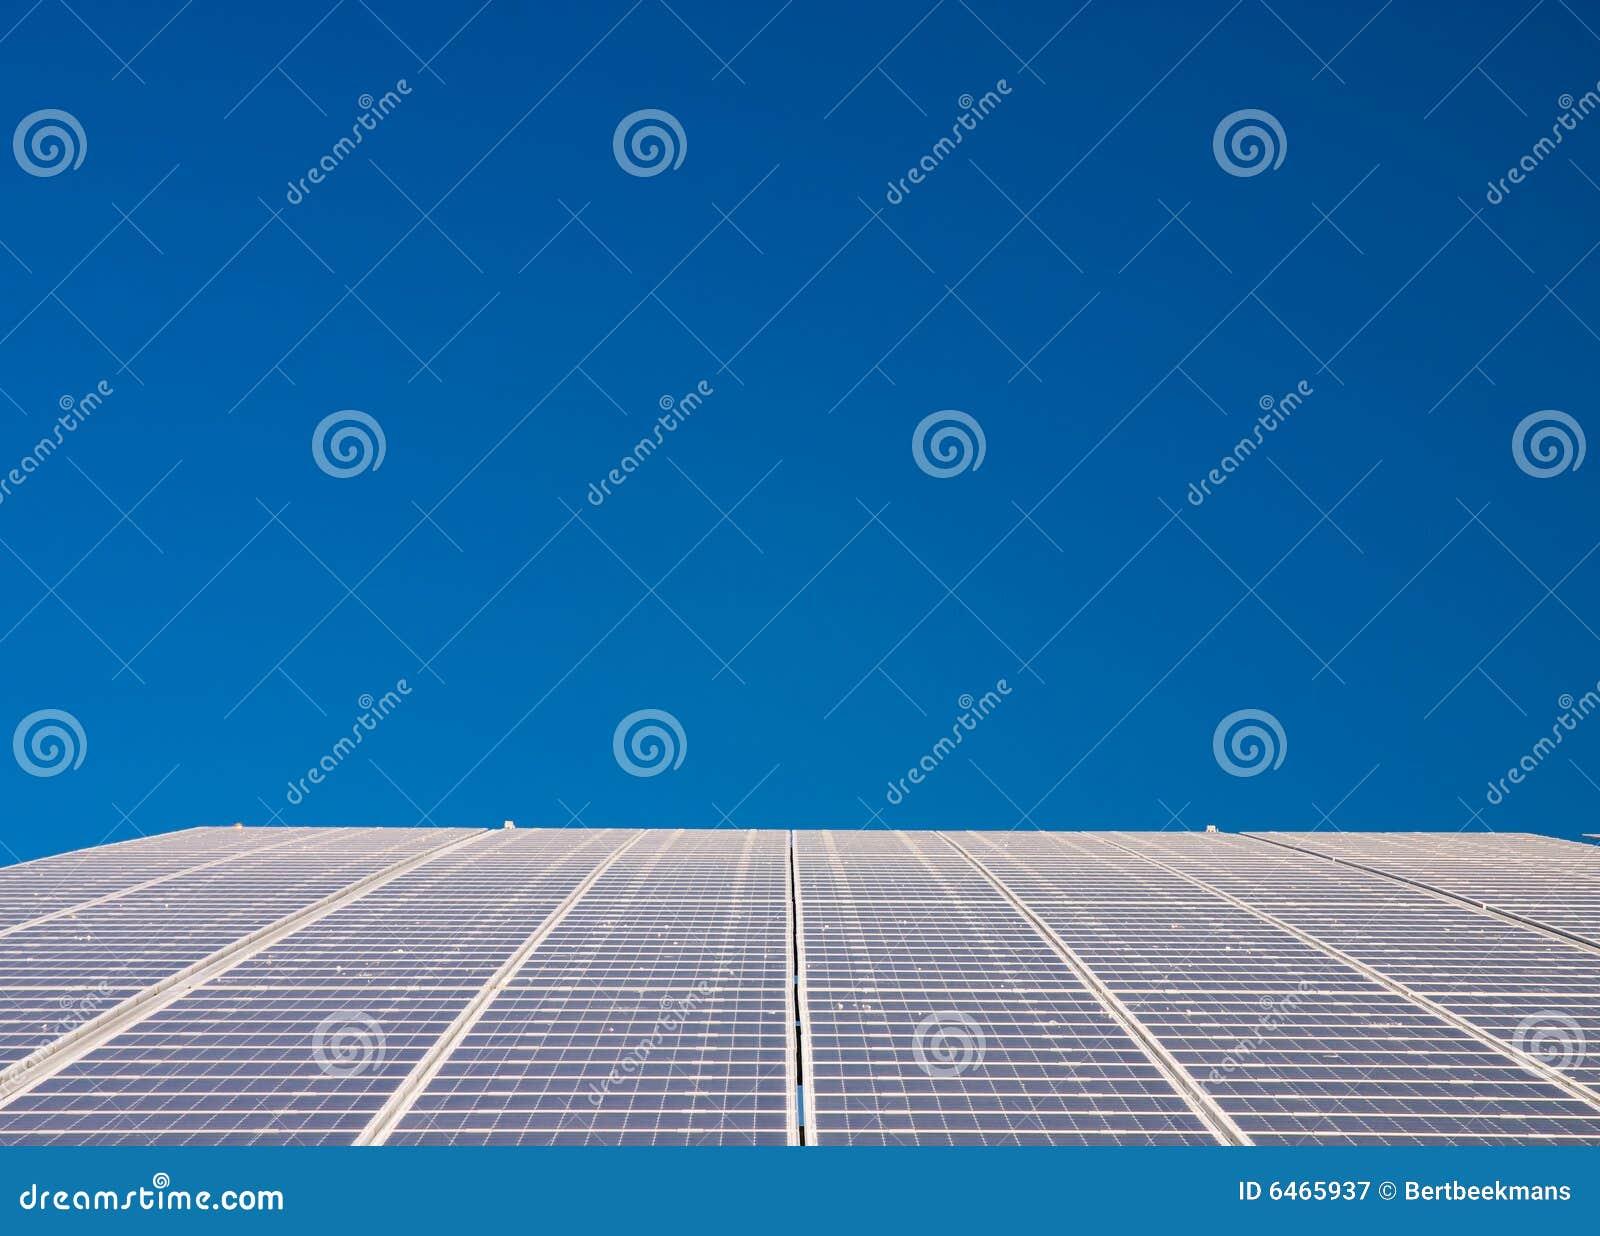 Power plant running on solar cells